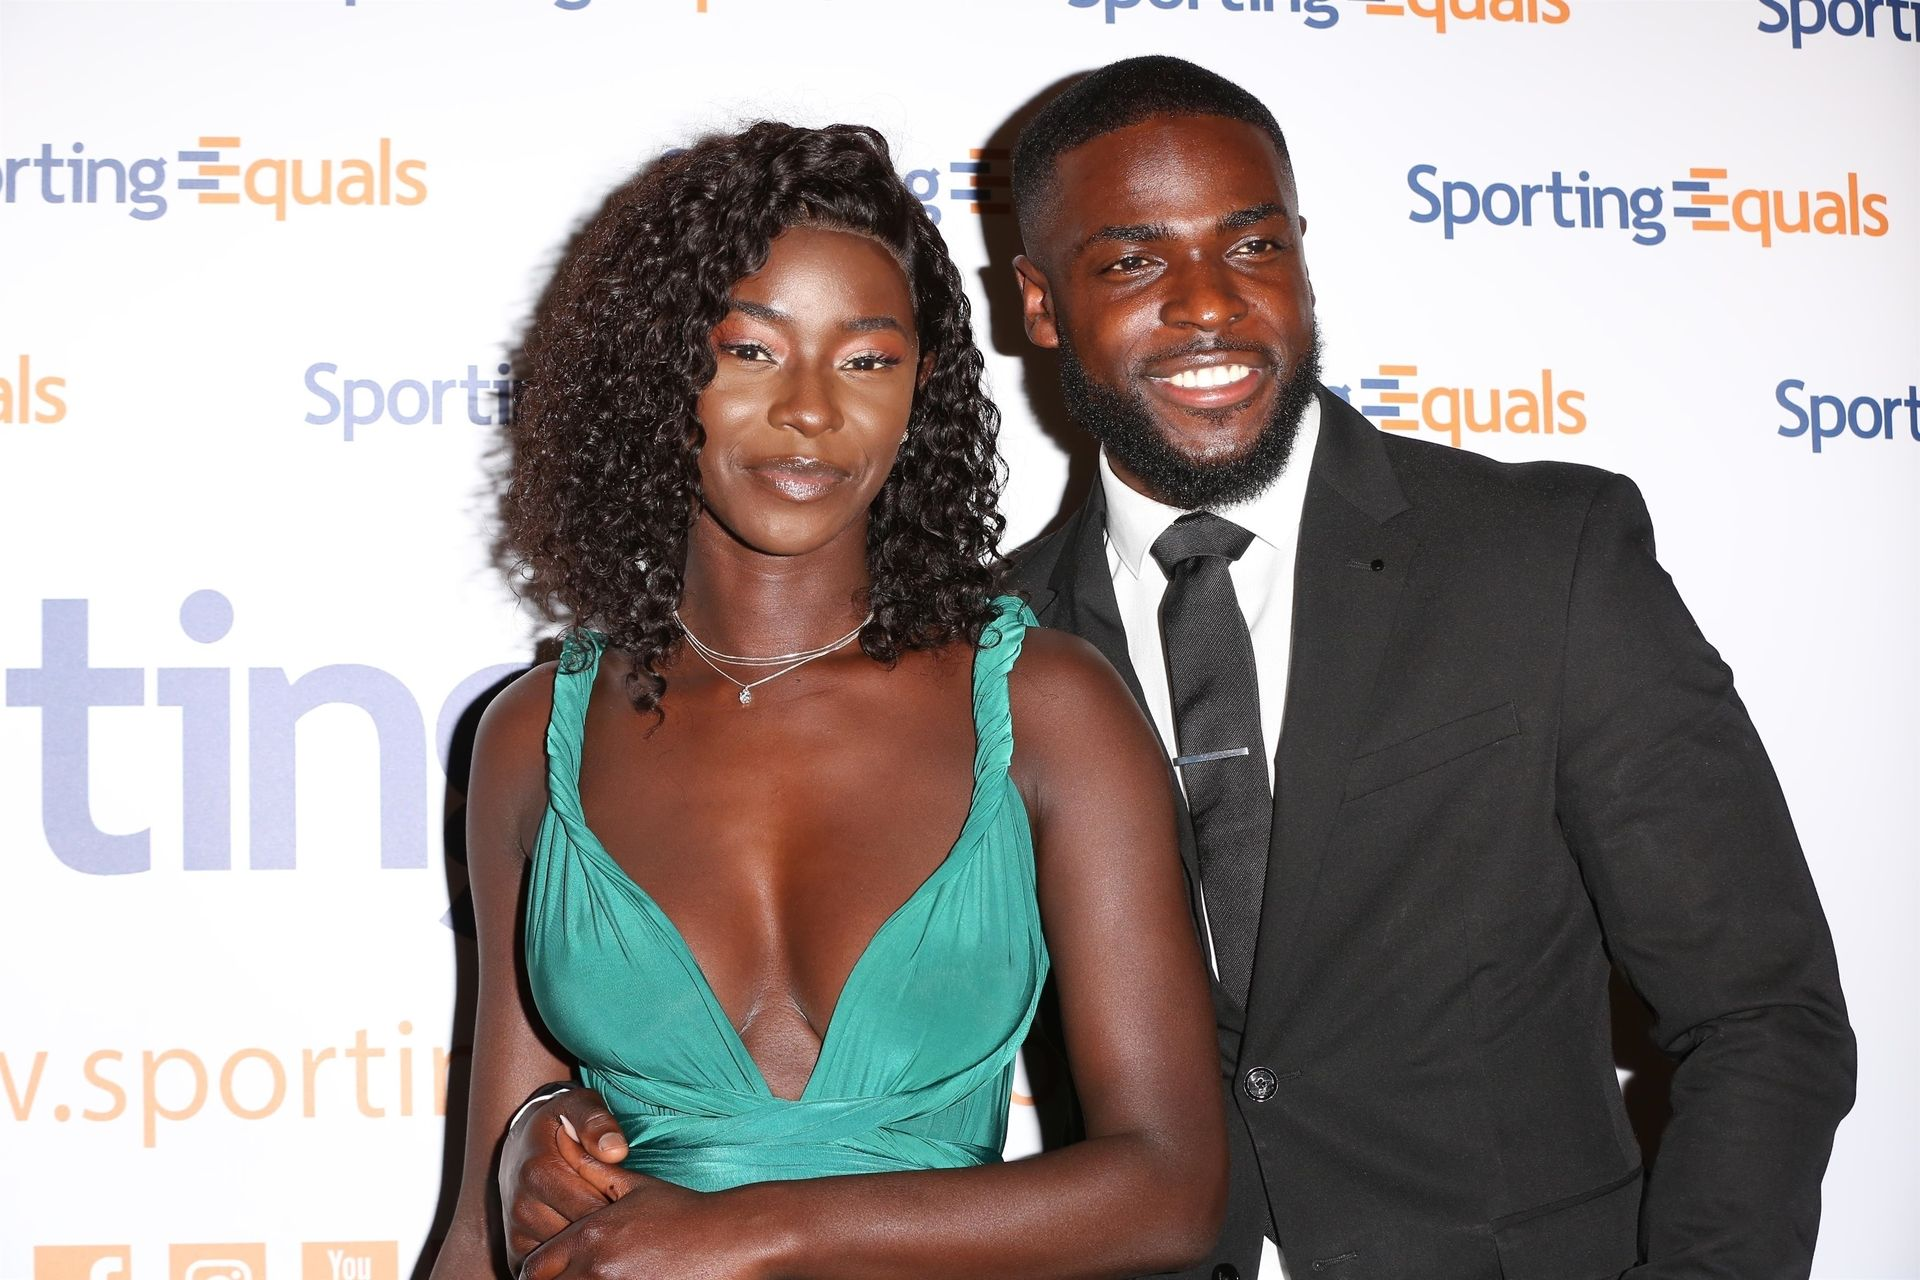 Mike Boateng & Priscilla Anyabu Are Seen At British Ethnic Diversity Sports Awards 0118